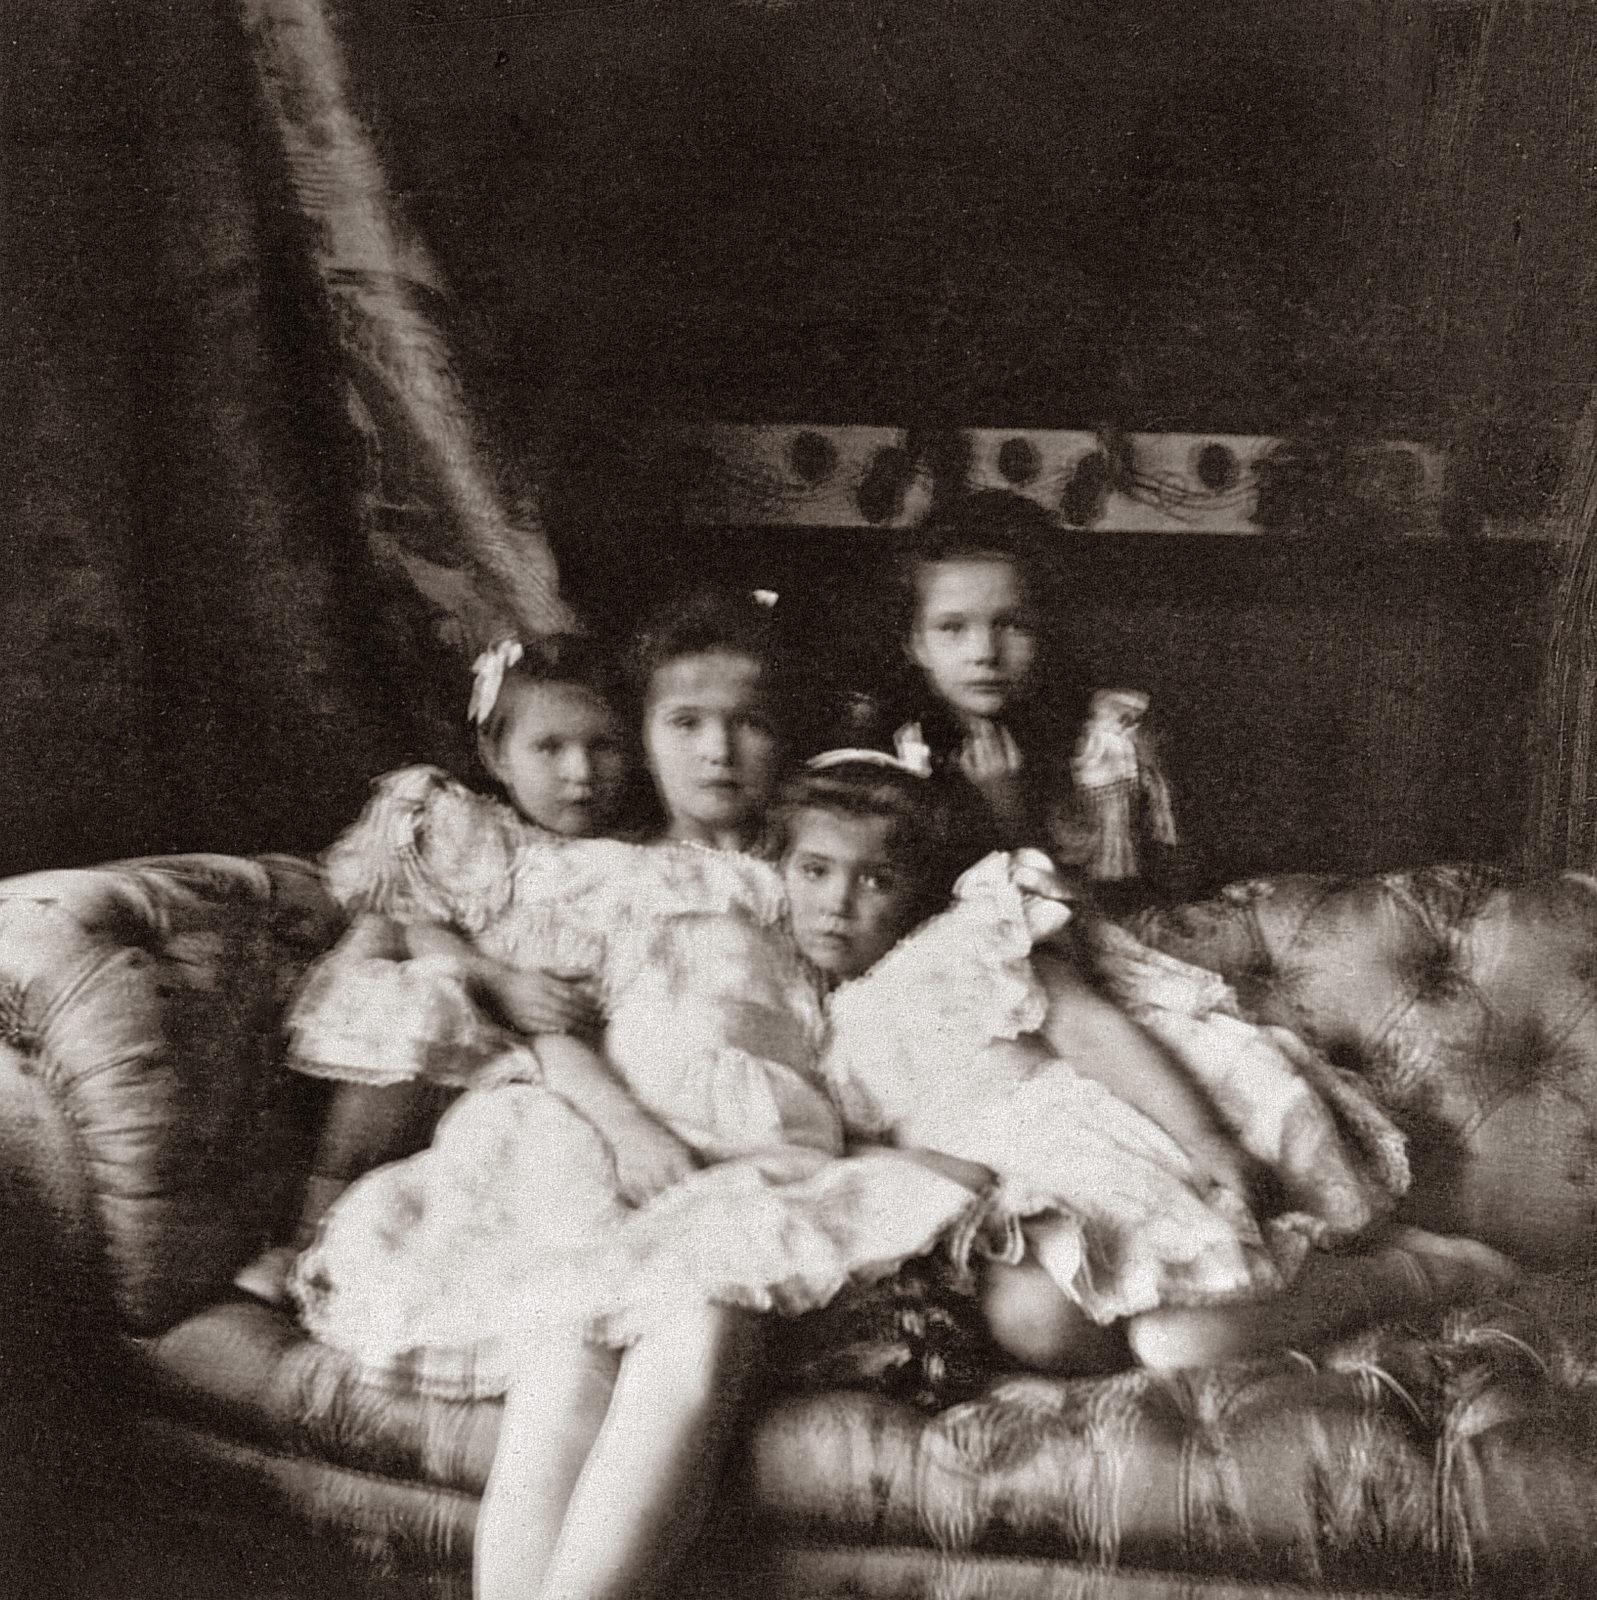 The Grand Duchesses Olga, Tatiana, Maria and Anastasia. Daughters of Emperor Nicholas II and Empress Alexandra Feodorovna. Photo of 1904.